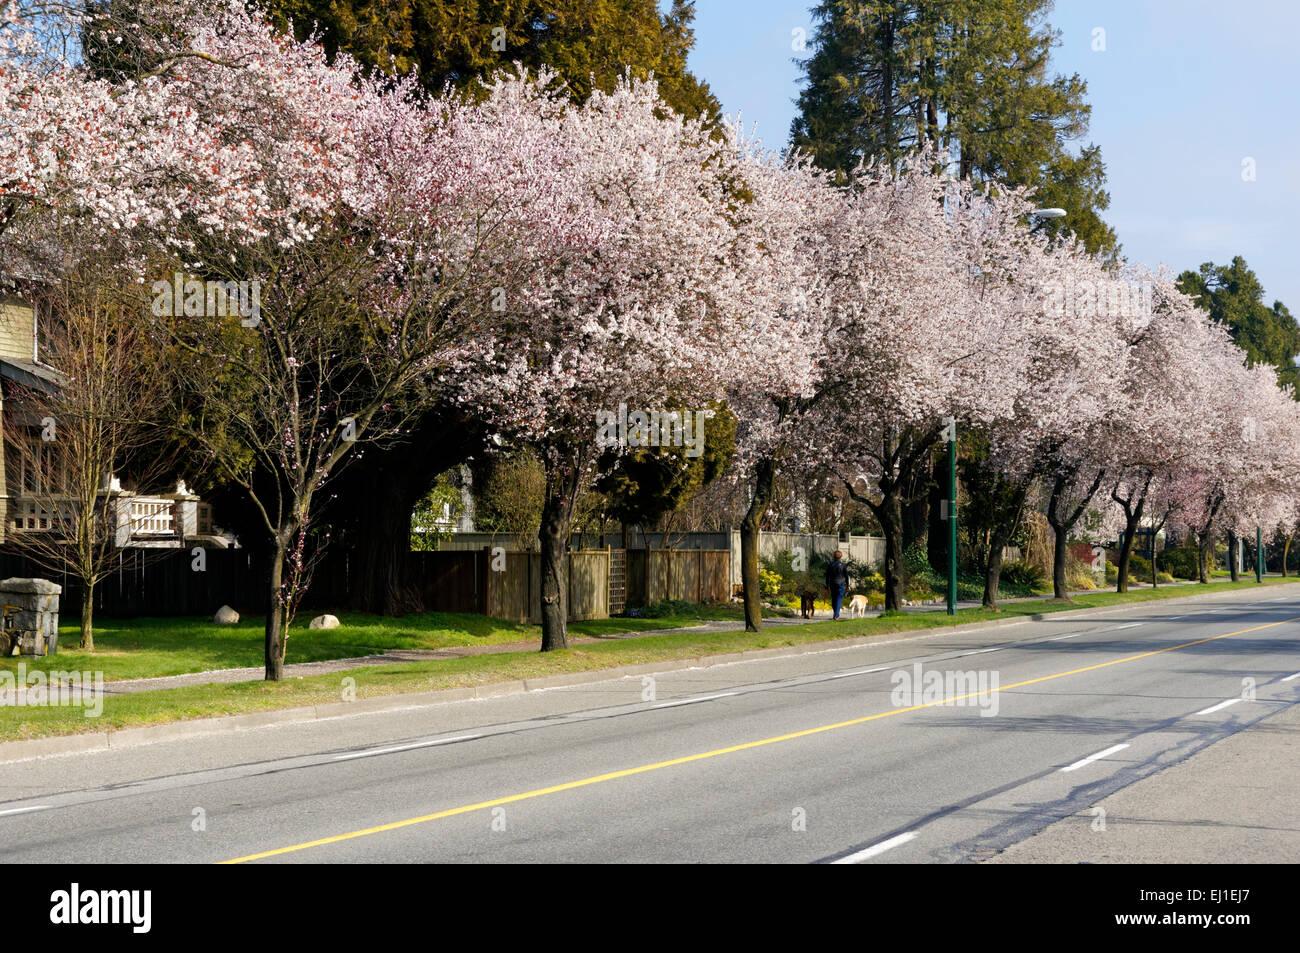 blossoming-japanese-ornamental-cherry-and-plum-trees-lining-west-16th-EJ1EJ7.jpg